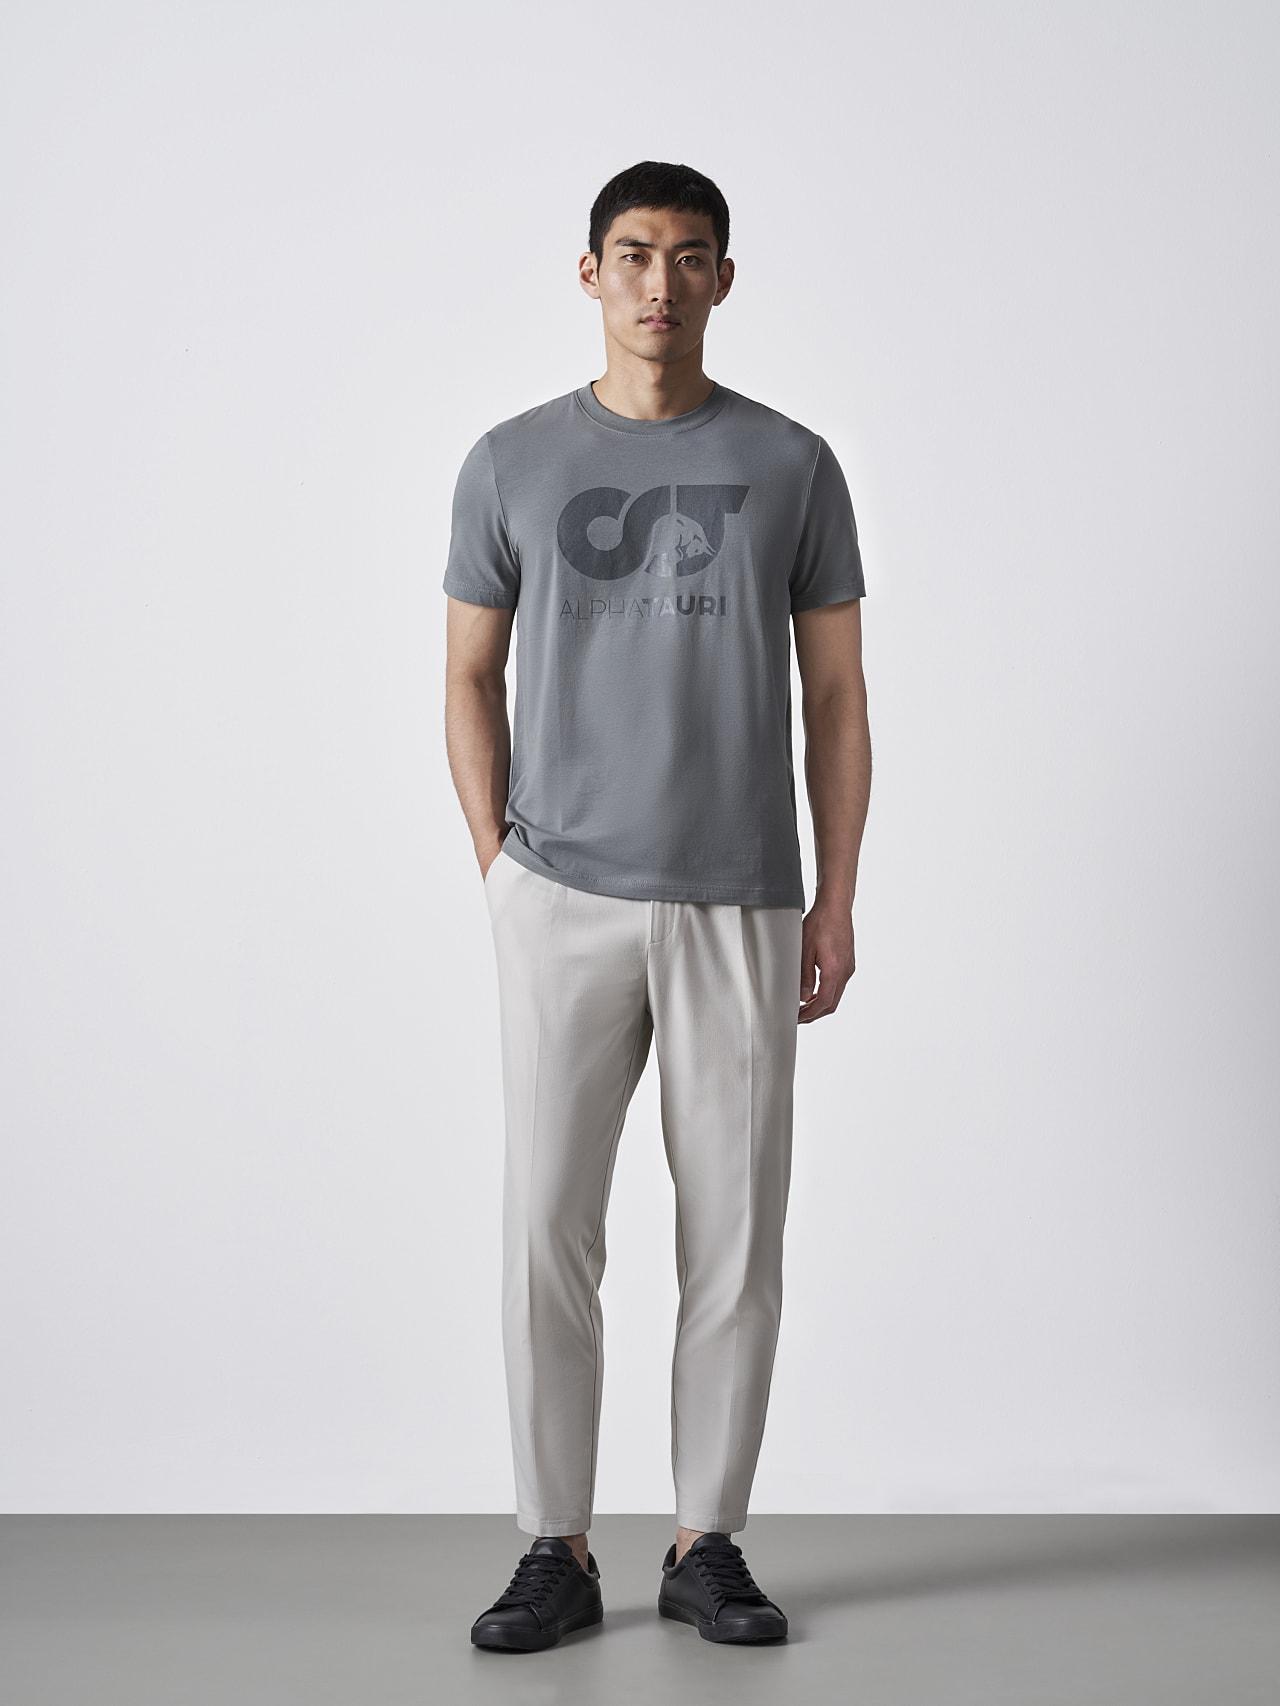 JERO V2.Y4.02 Signature Logo T-Shirt Grey Right Alpha Tauri